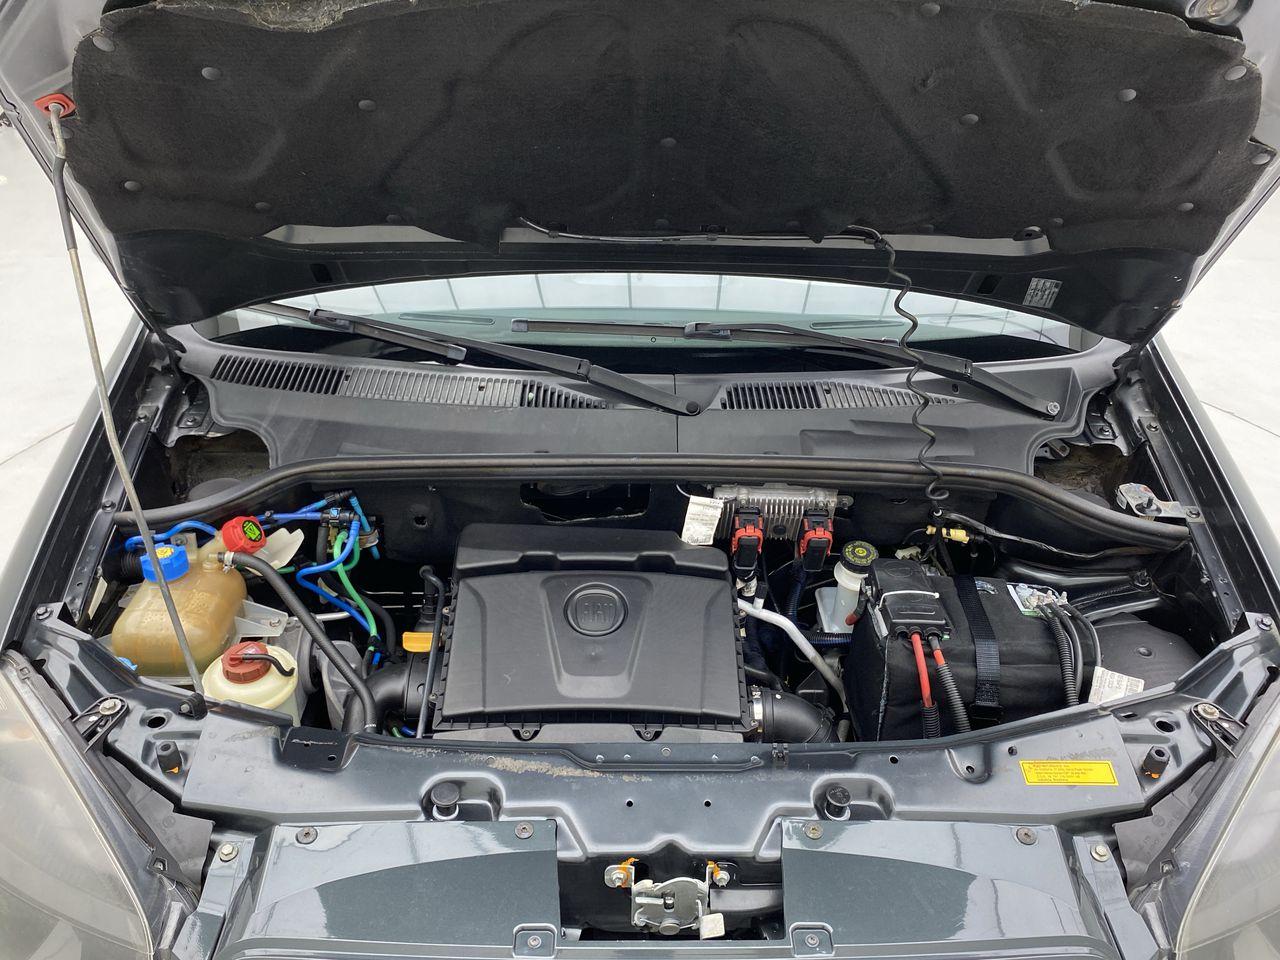 Fiat Doblo Adv/Adv TRYON/LOCKER 1.8 Flex